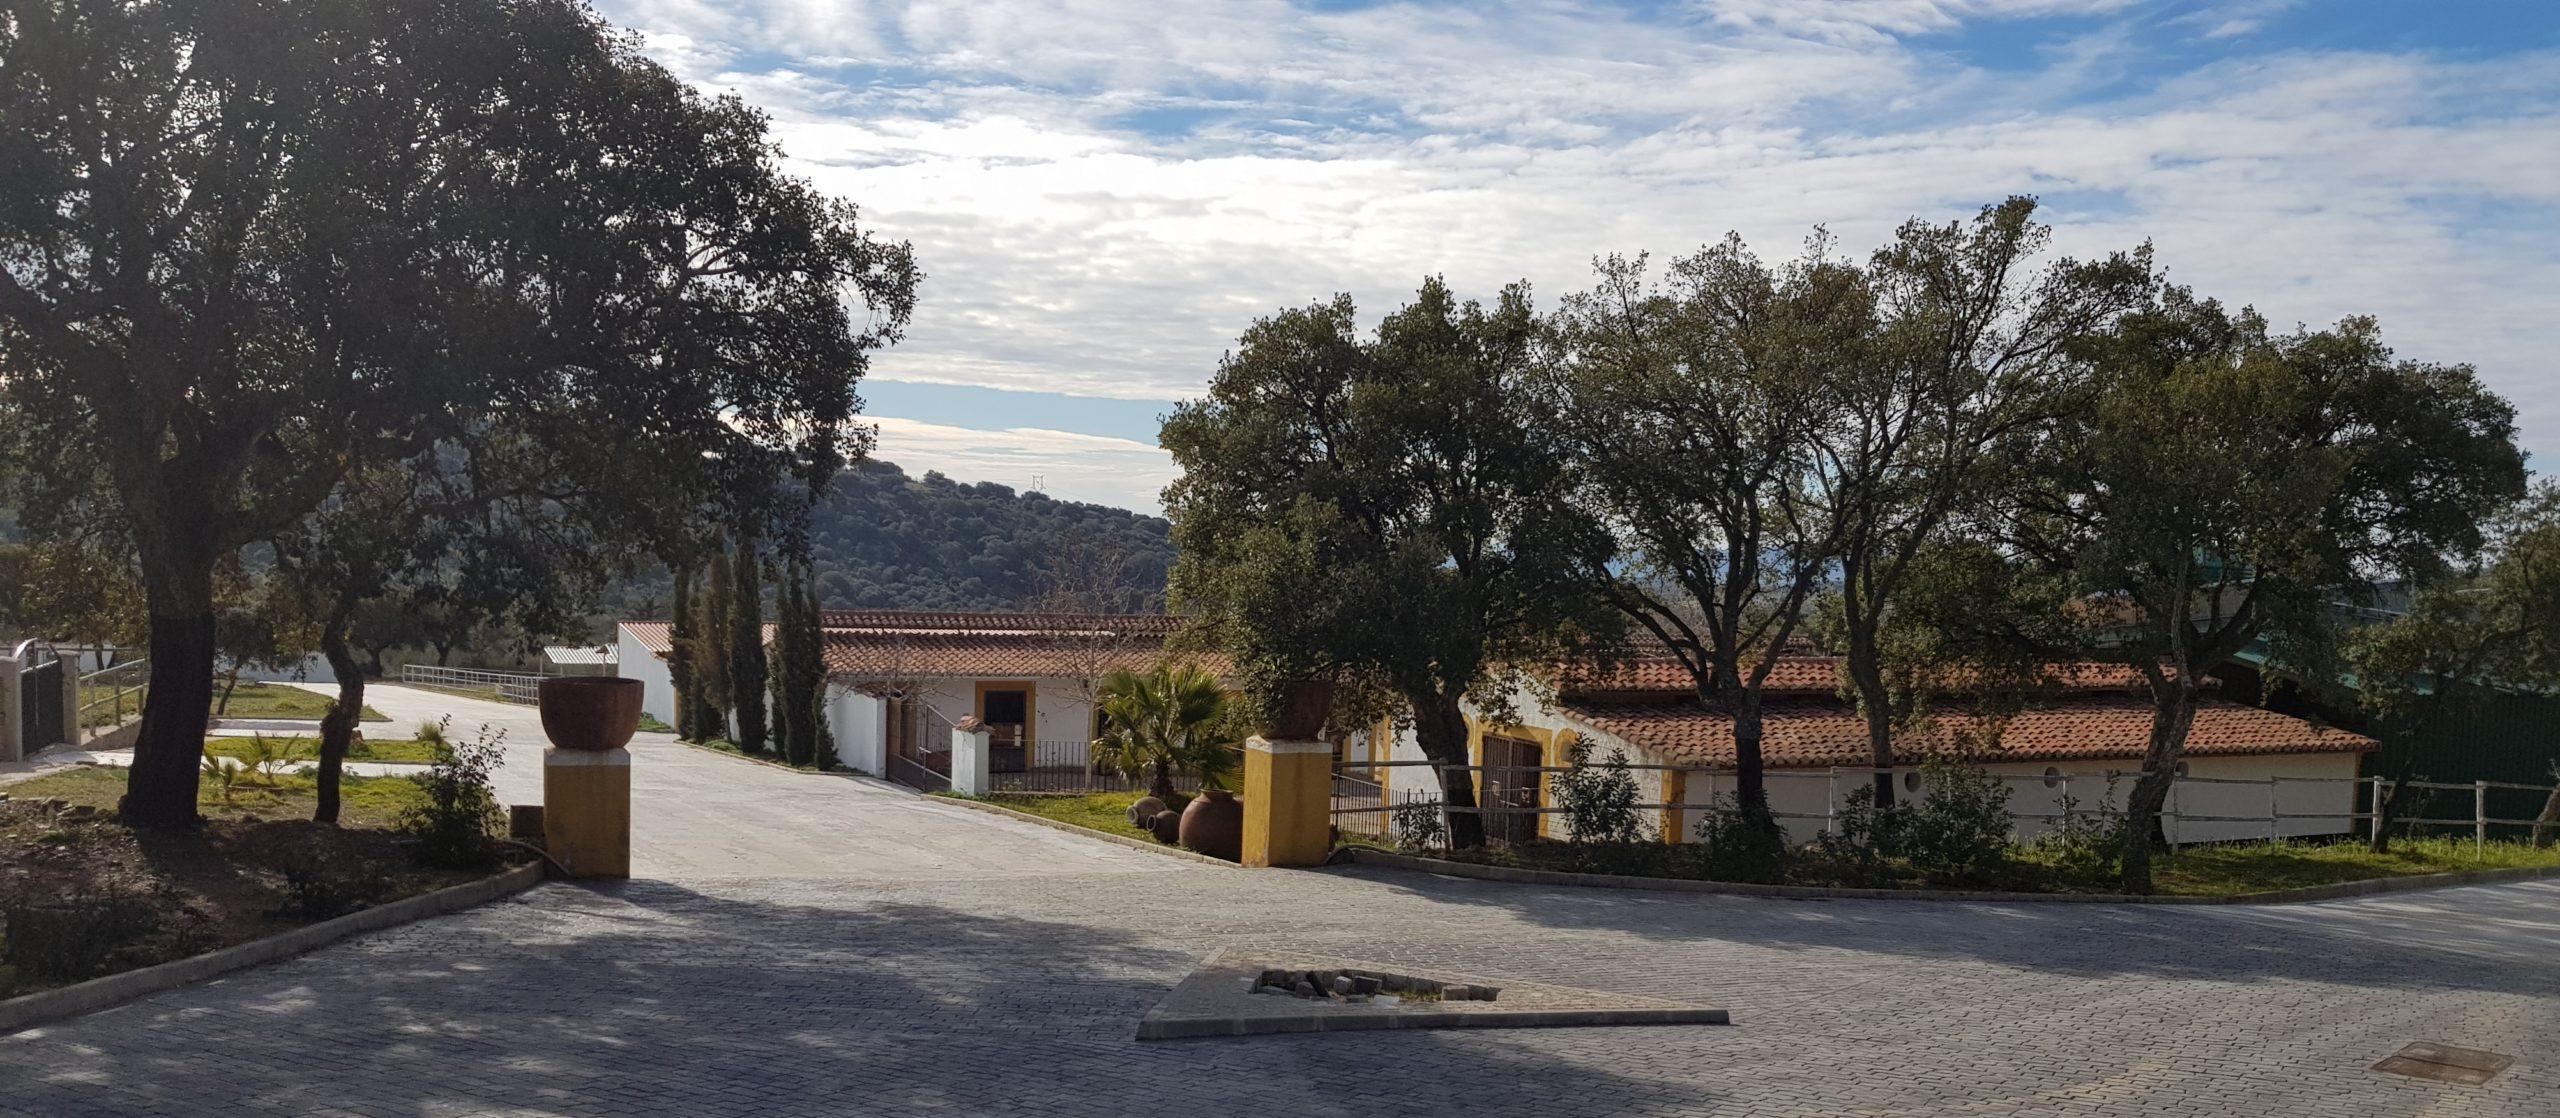 Resort Hipico El Hinojal (1) (6)